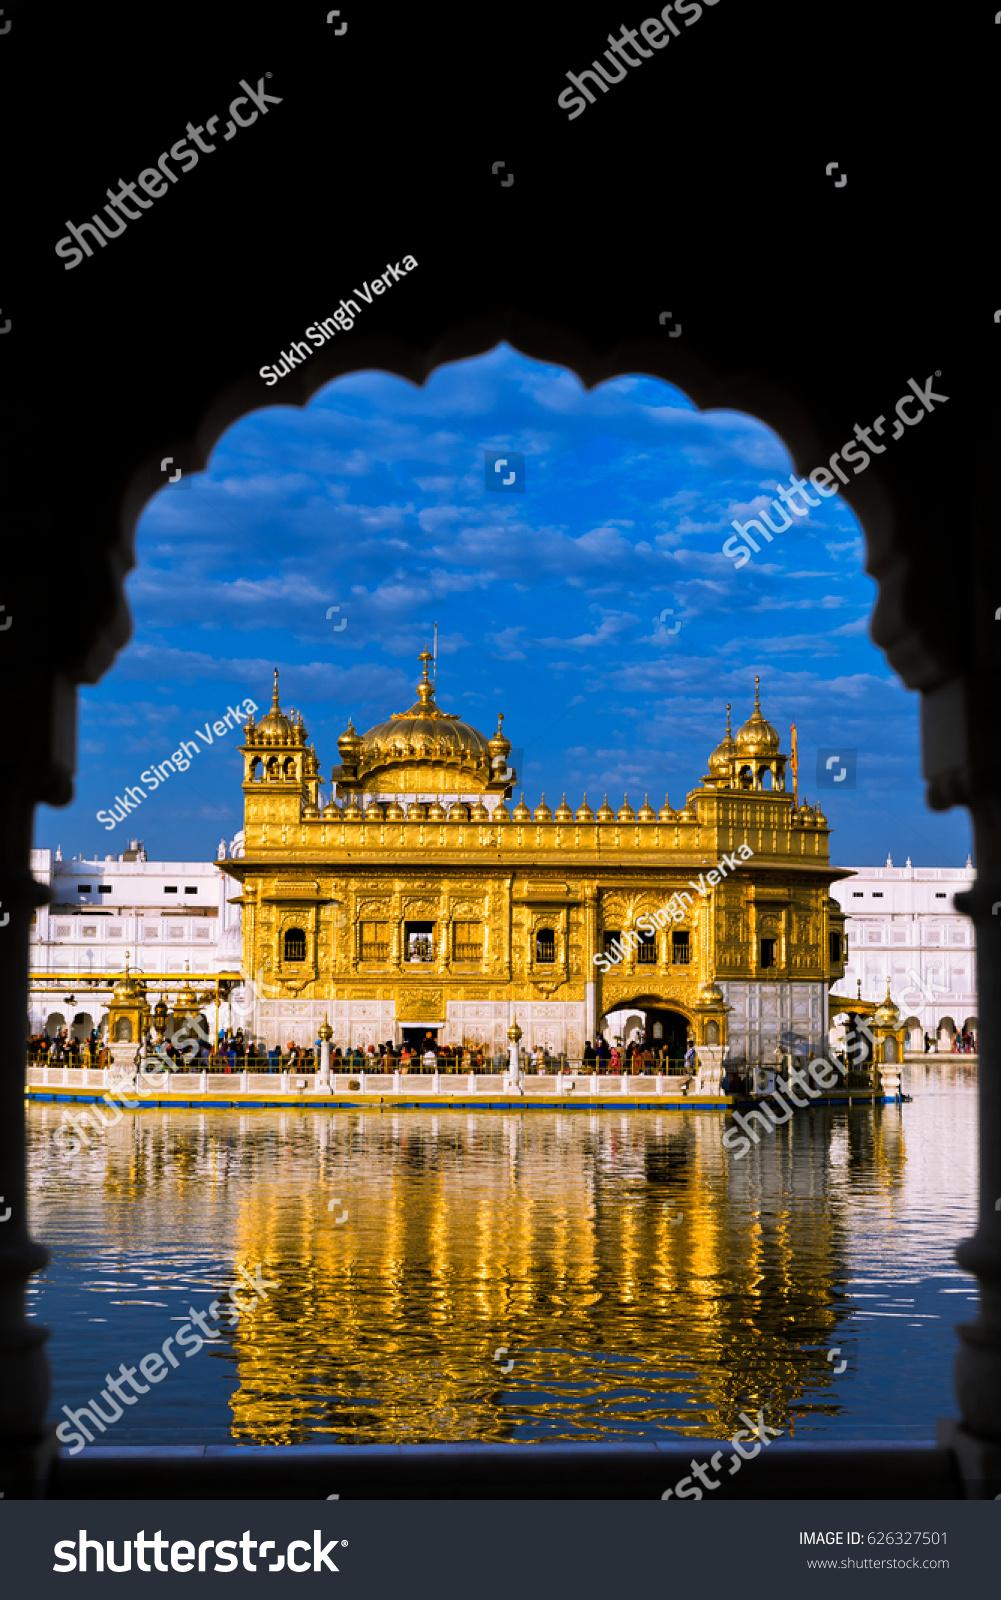 golden temple amritsar portrait dimension stock photo (100% legal